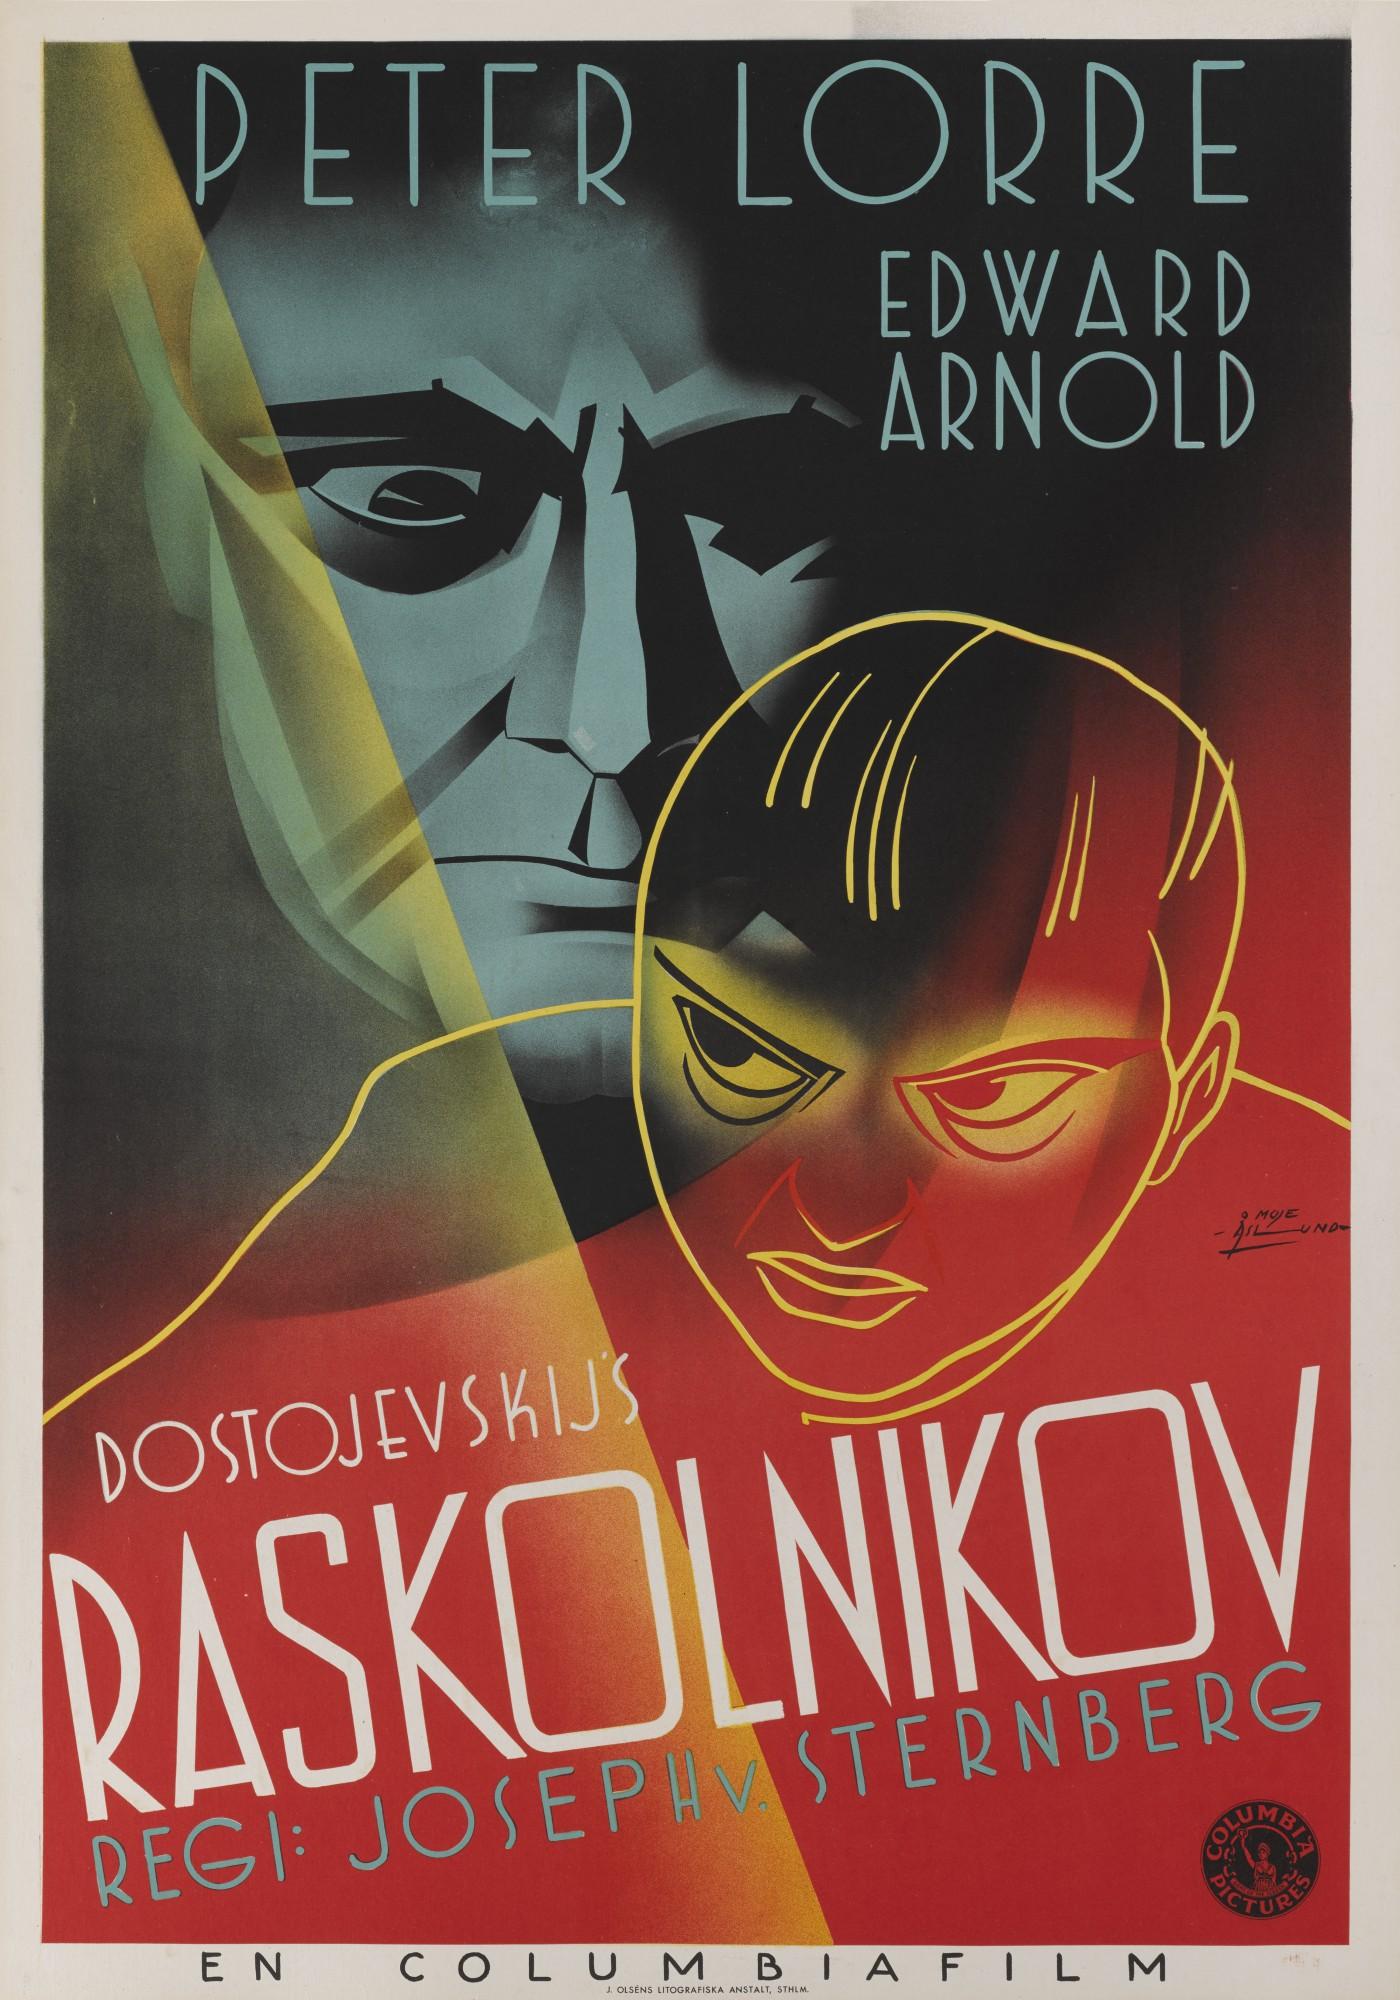 CRIME AND PUNISHMENT/RASKOLNIKOV (1935) POSTER, SWEDISH